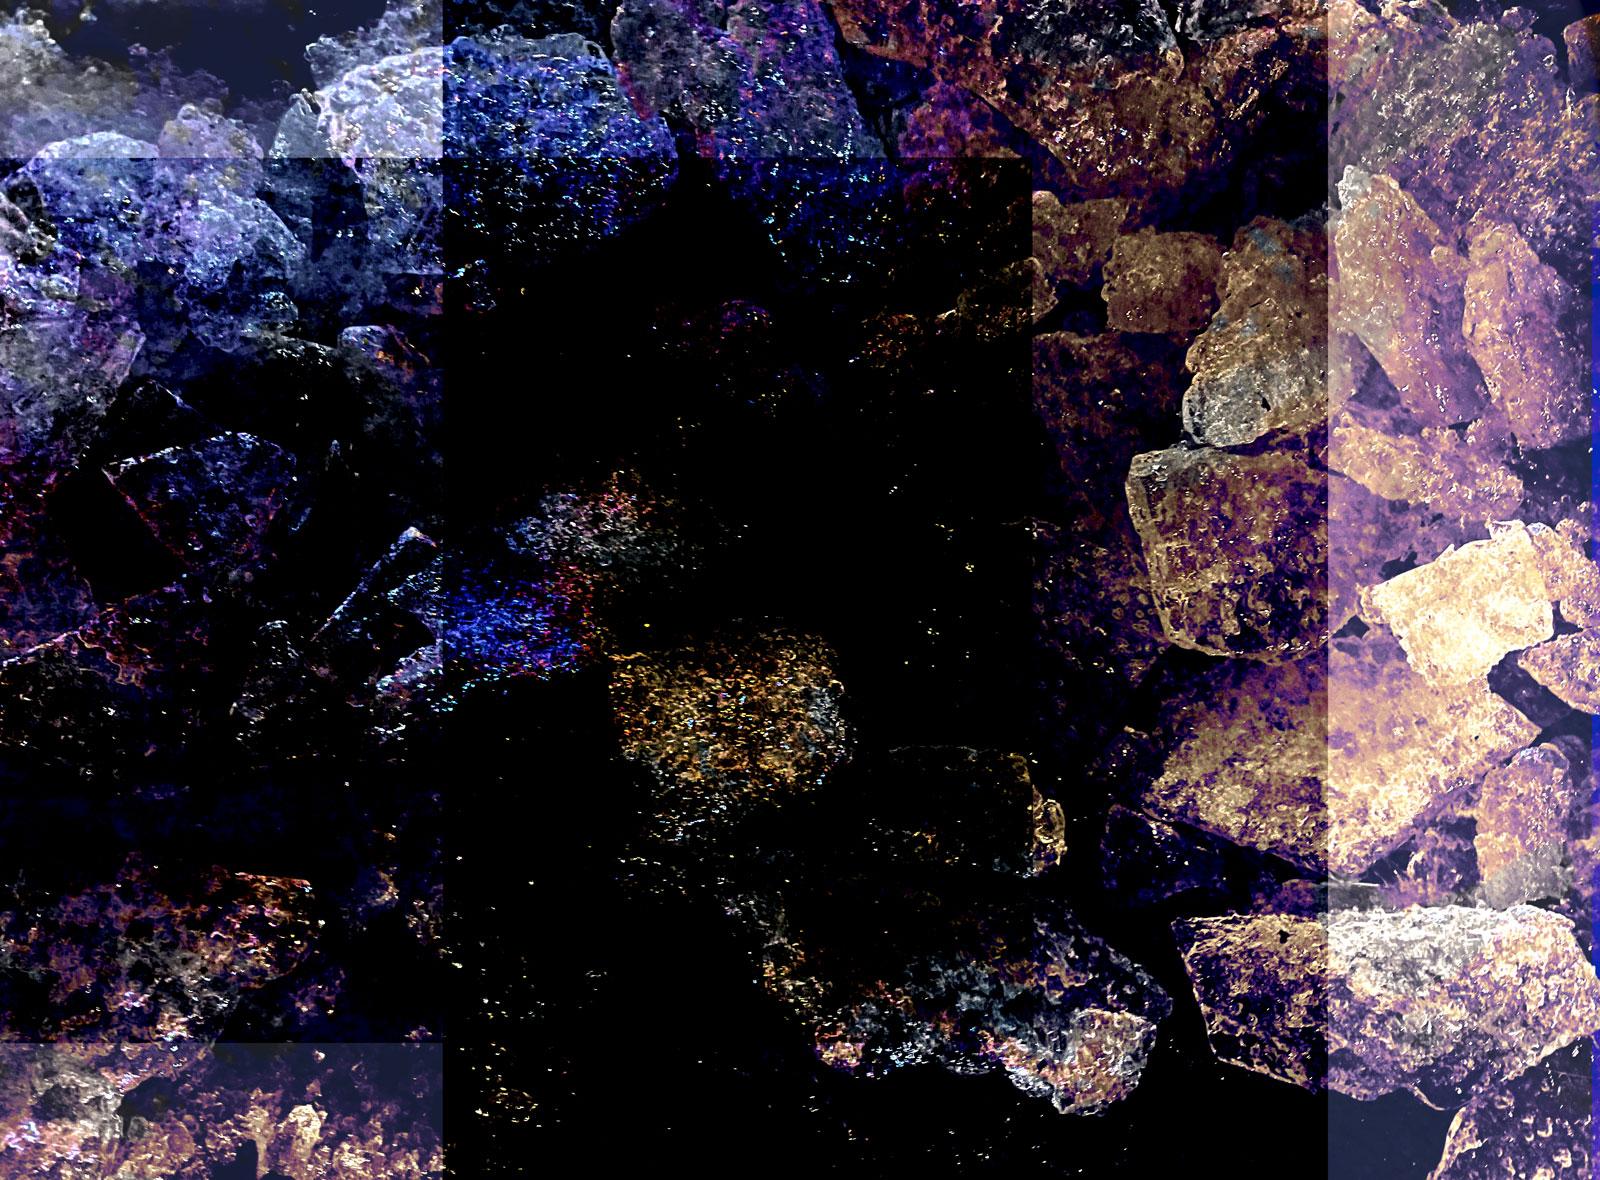 Elemental Frost N03 - Crystals • 122 x 90 cm (48.03 x 35.43 in)